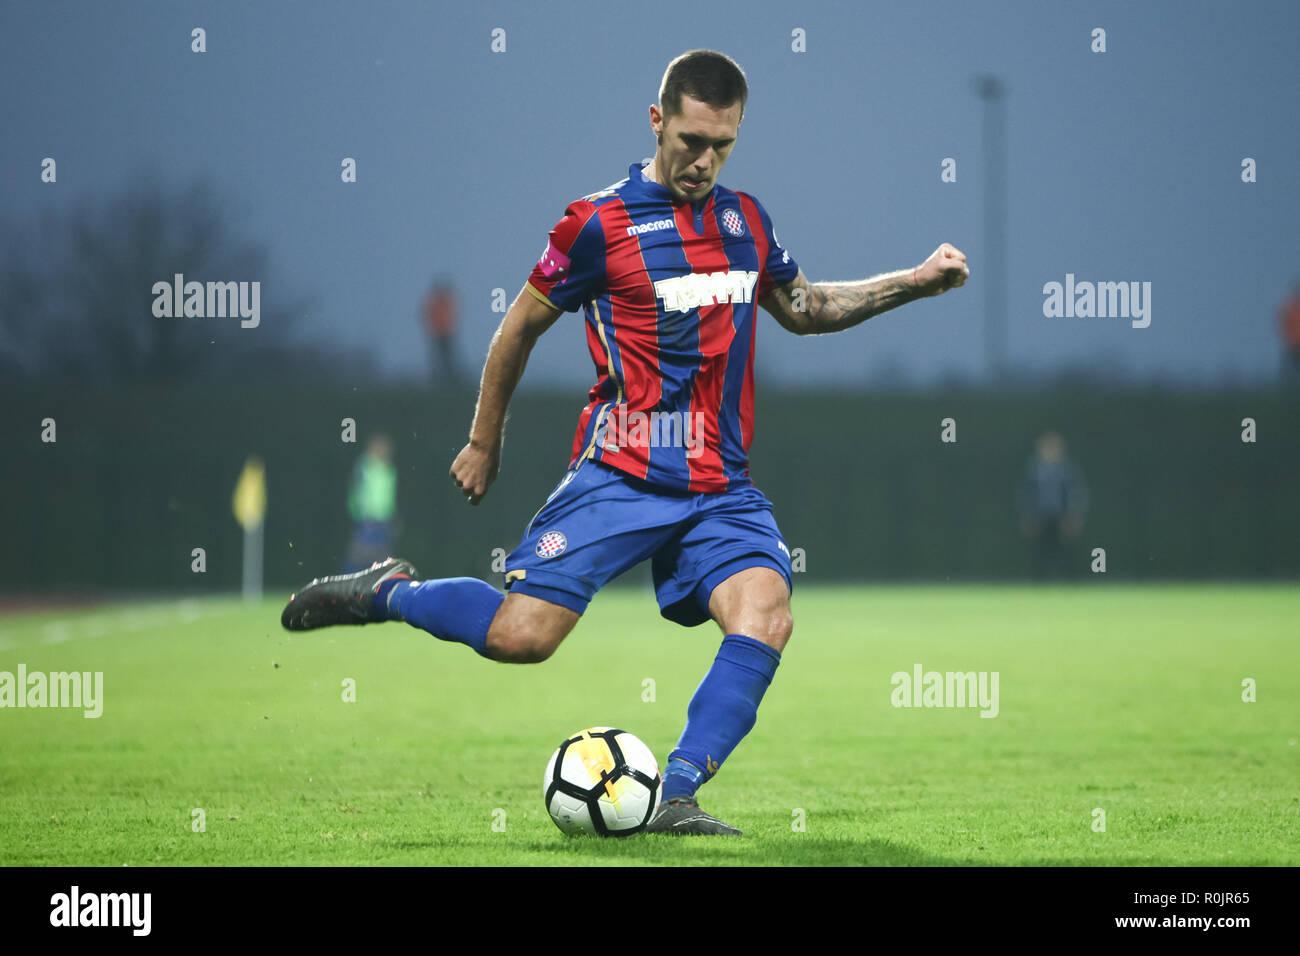 Velika Gorica, Croatia - 4th November 2018 : The first football Croatian league Hrvatski Telekom, football game between Hnk Gorica and Hajduk on Goric - Stock Image